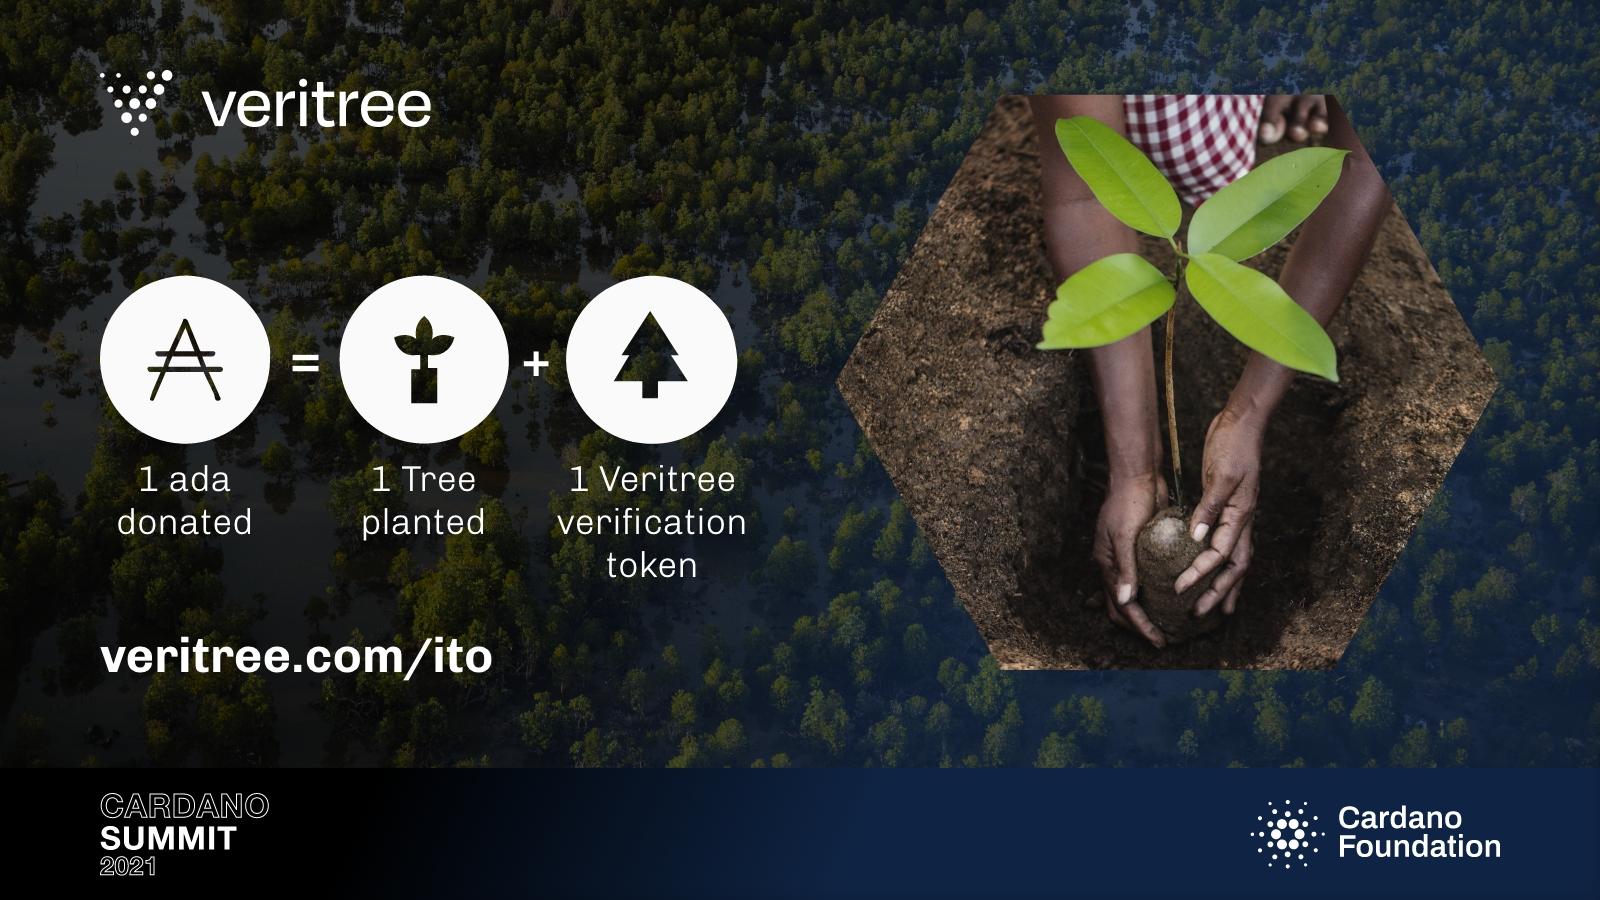 Veritree 1 ada donated equals 1 tree planted + 1 Veritree verification token